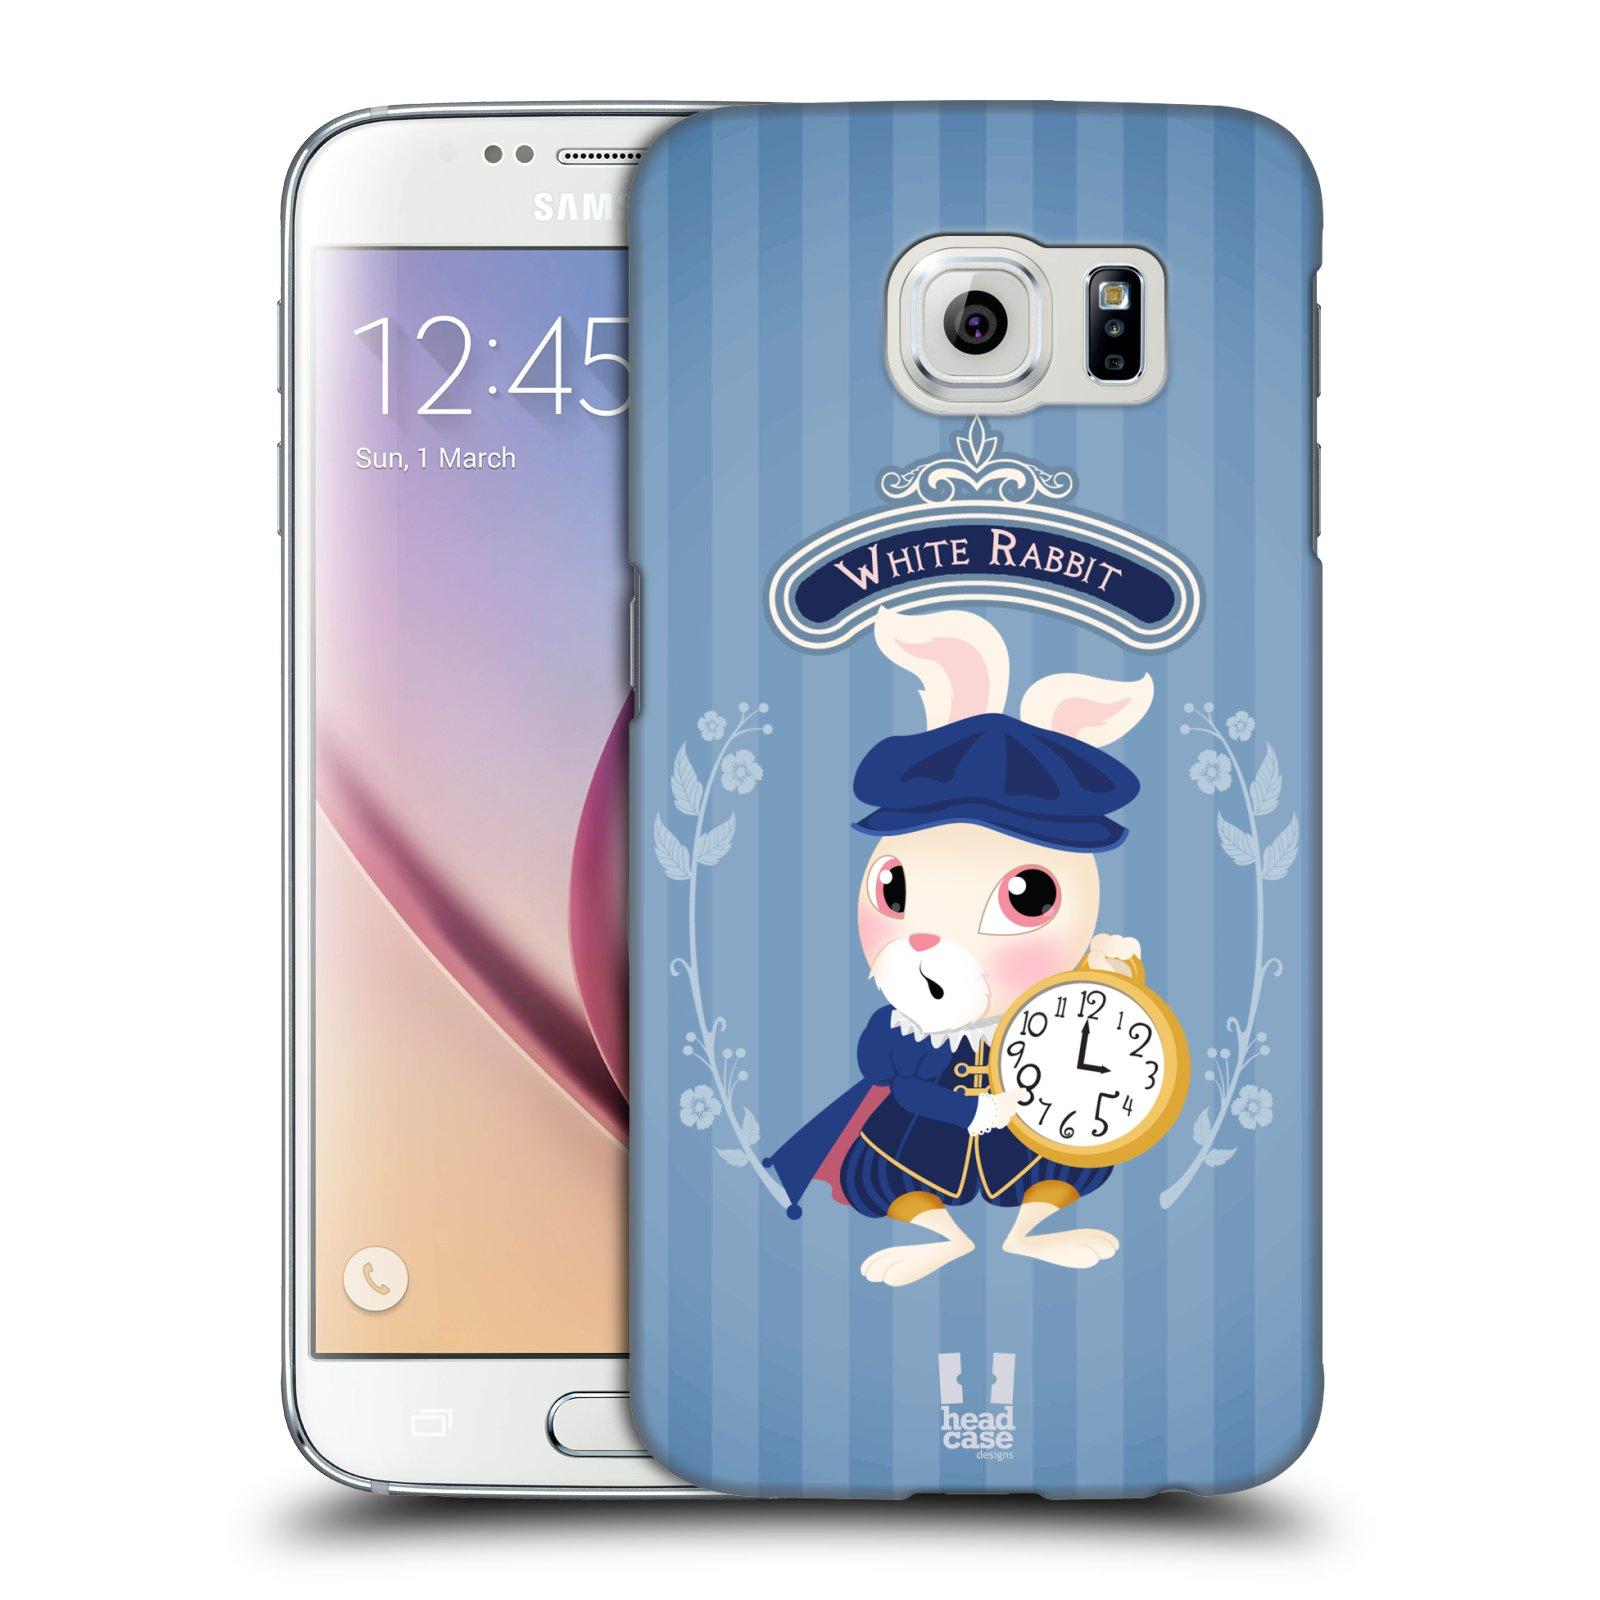 HEAD CASE plastový obal na mobil SAMSUNG Galaxy S6 (G9200, G920F) vzor Alenka v říši divů králíček